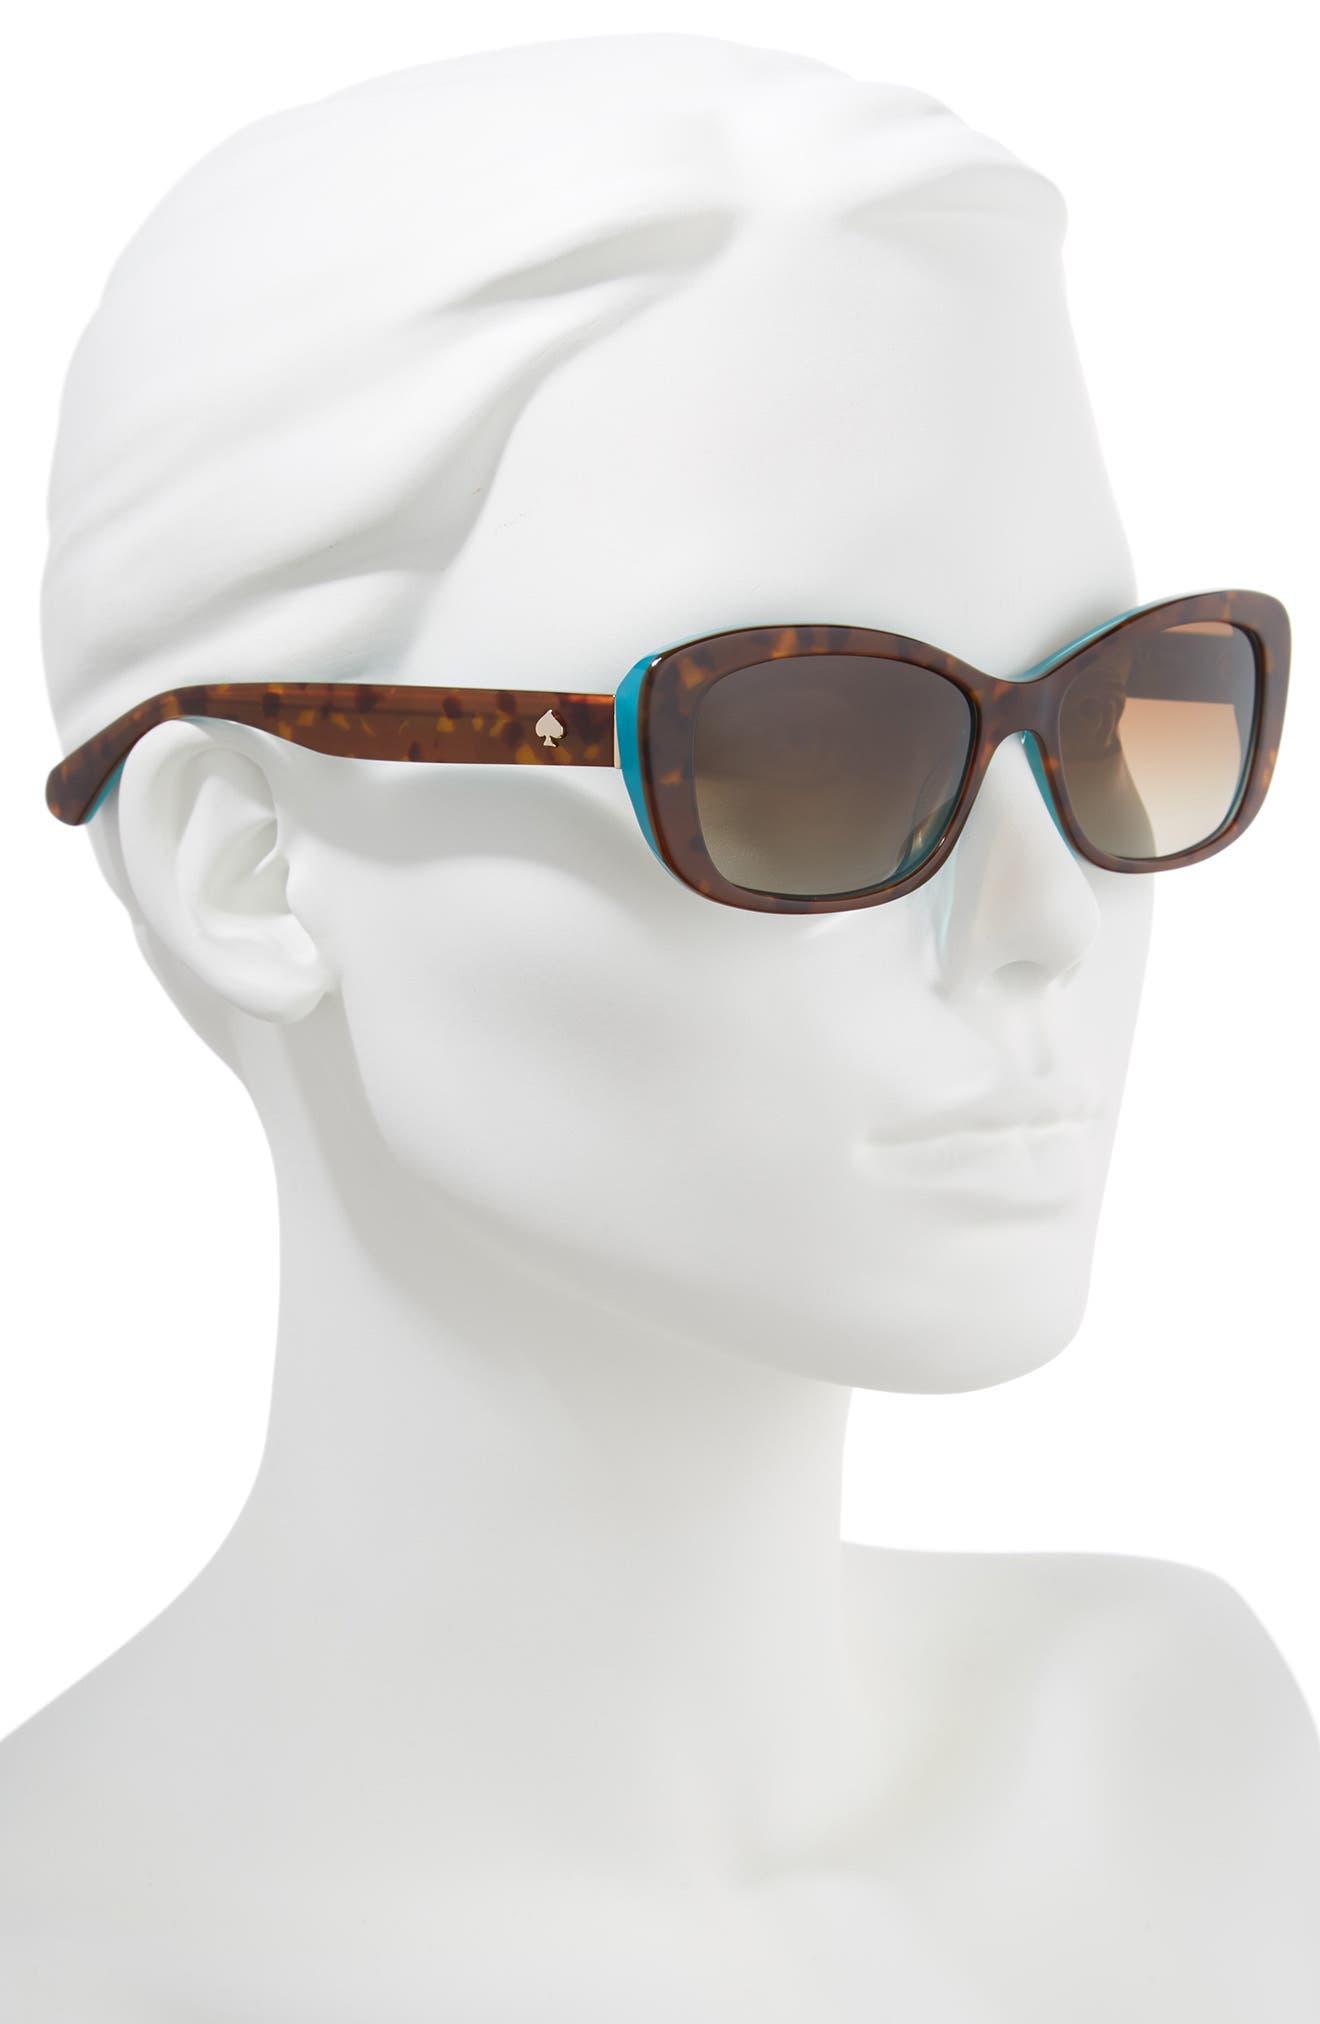 claretta 53mm polarized sunglasses,                             Alternate thumbnail 2, color,                             Havana/ Aqua